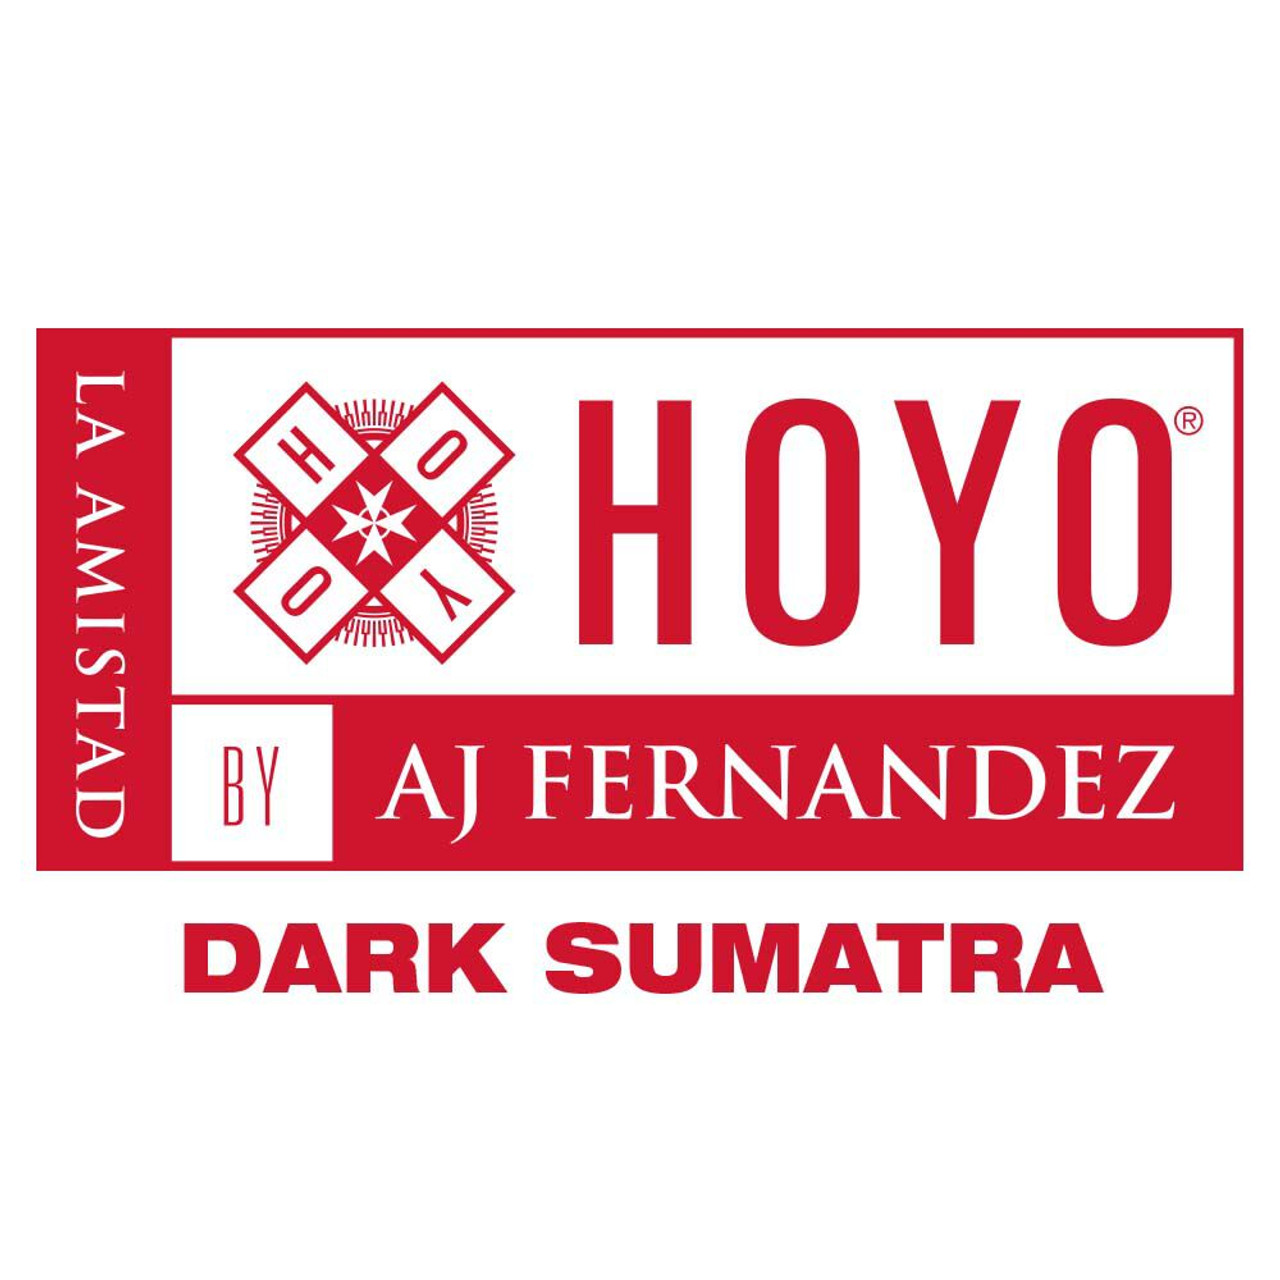 Hoyo La Amistad Dark Sumatra Media Noche Cigars - 5.75 x 54 (Box of 25)